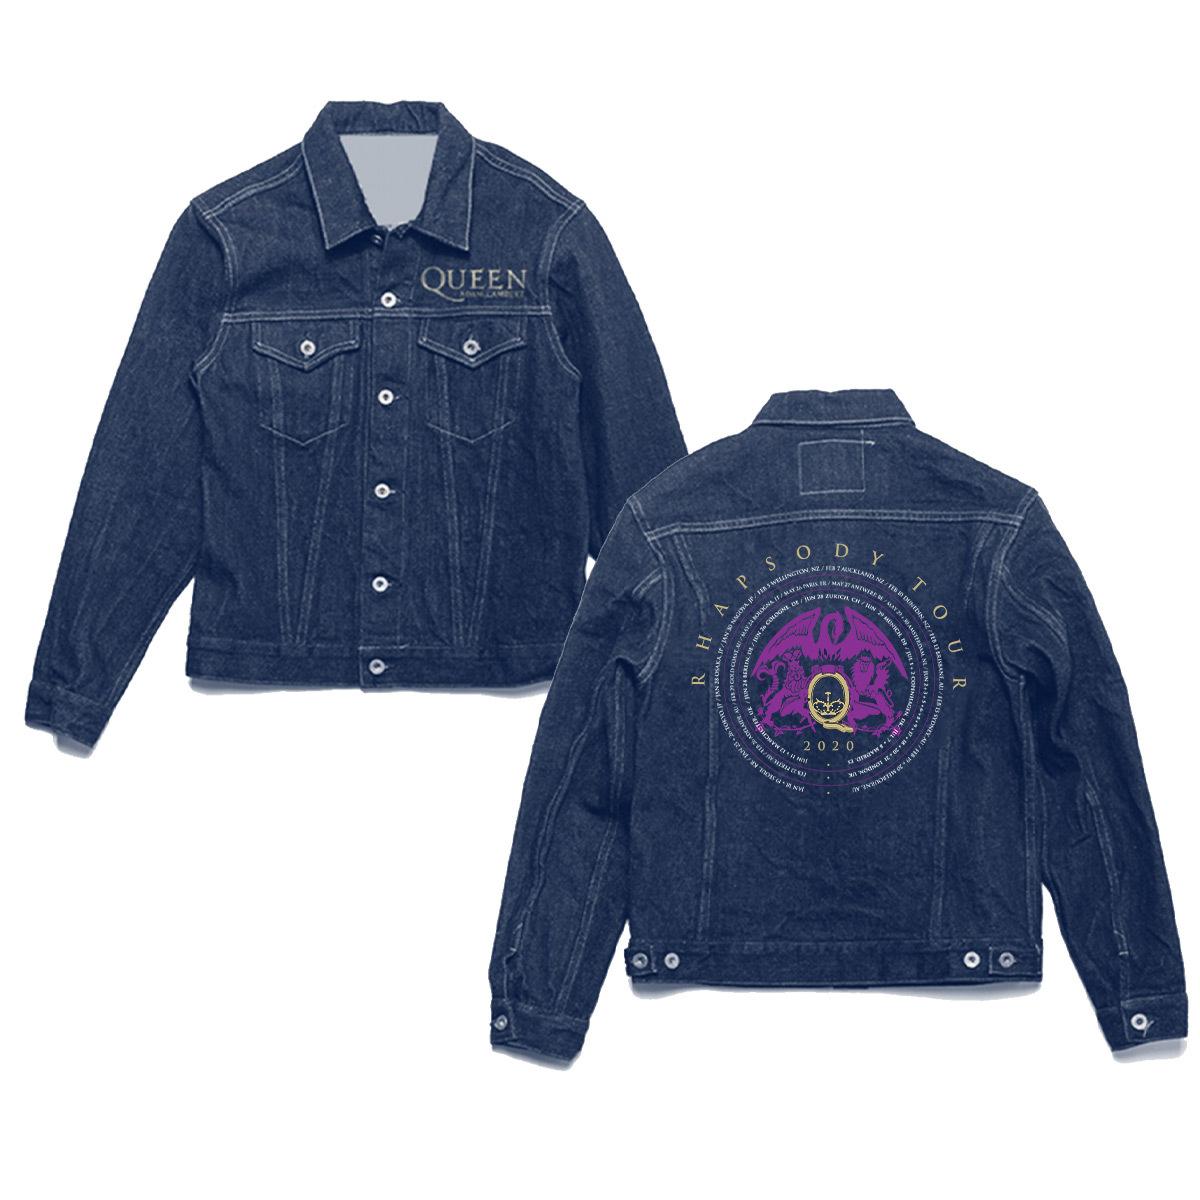 2020 Dateback Denim Jacket